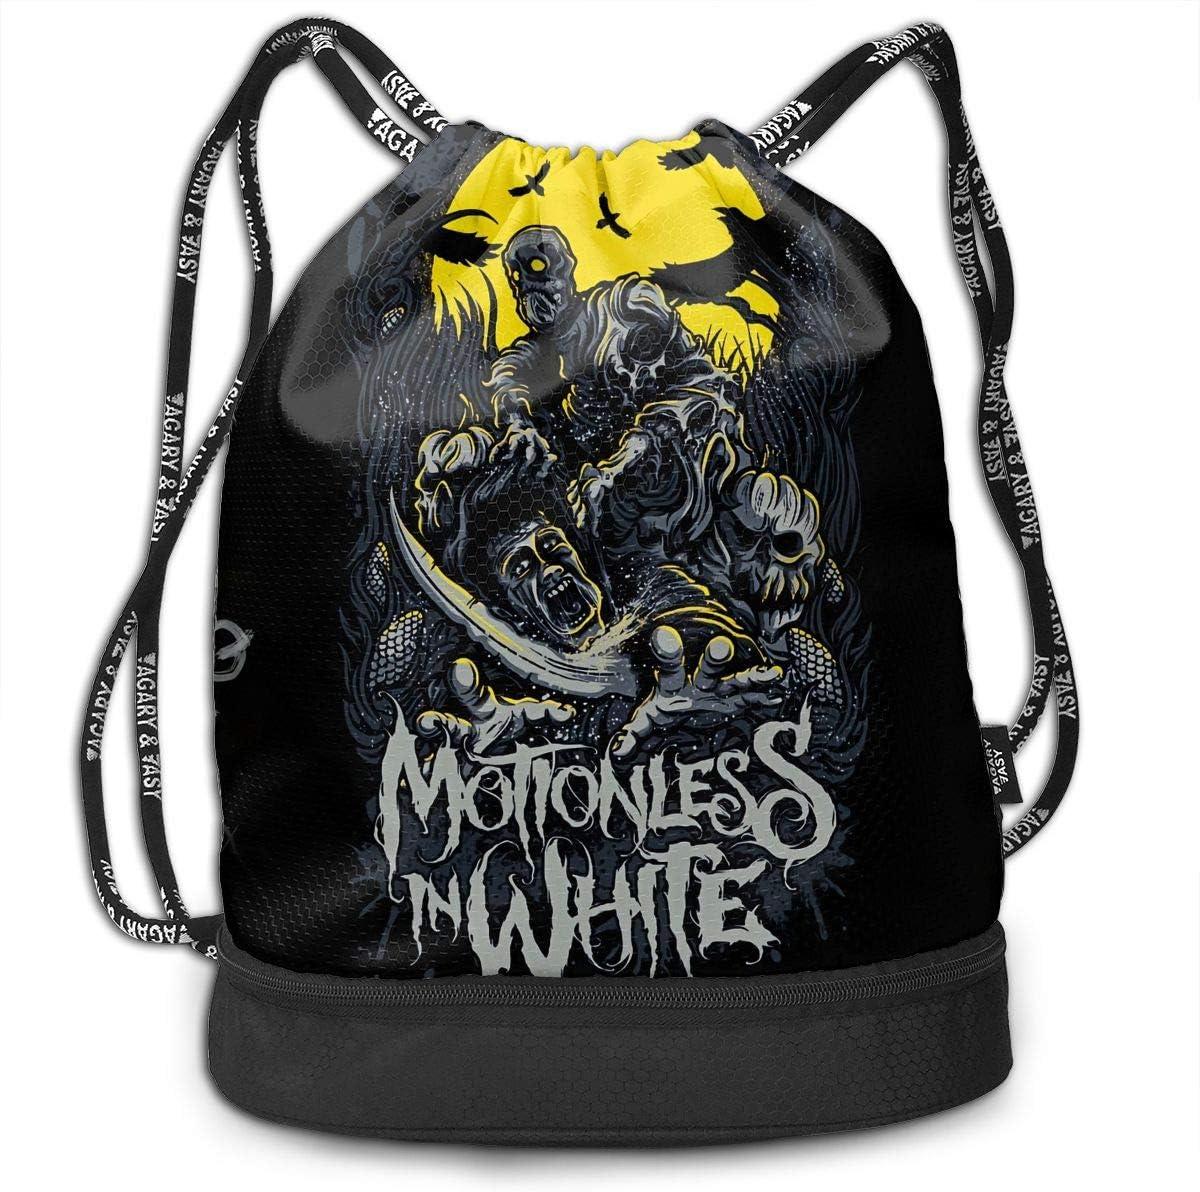 Thomas C Gaona Botanica Original Shoulder Bag Drawstring Backpack Beam Mouth Single Pocket Outdoor Shopping Bag Backpack